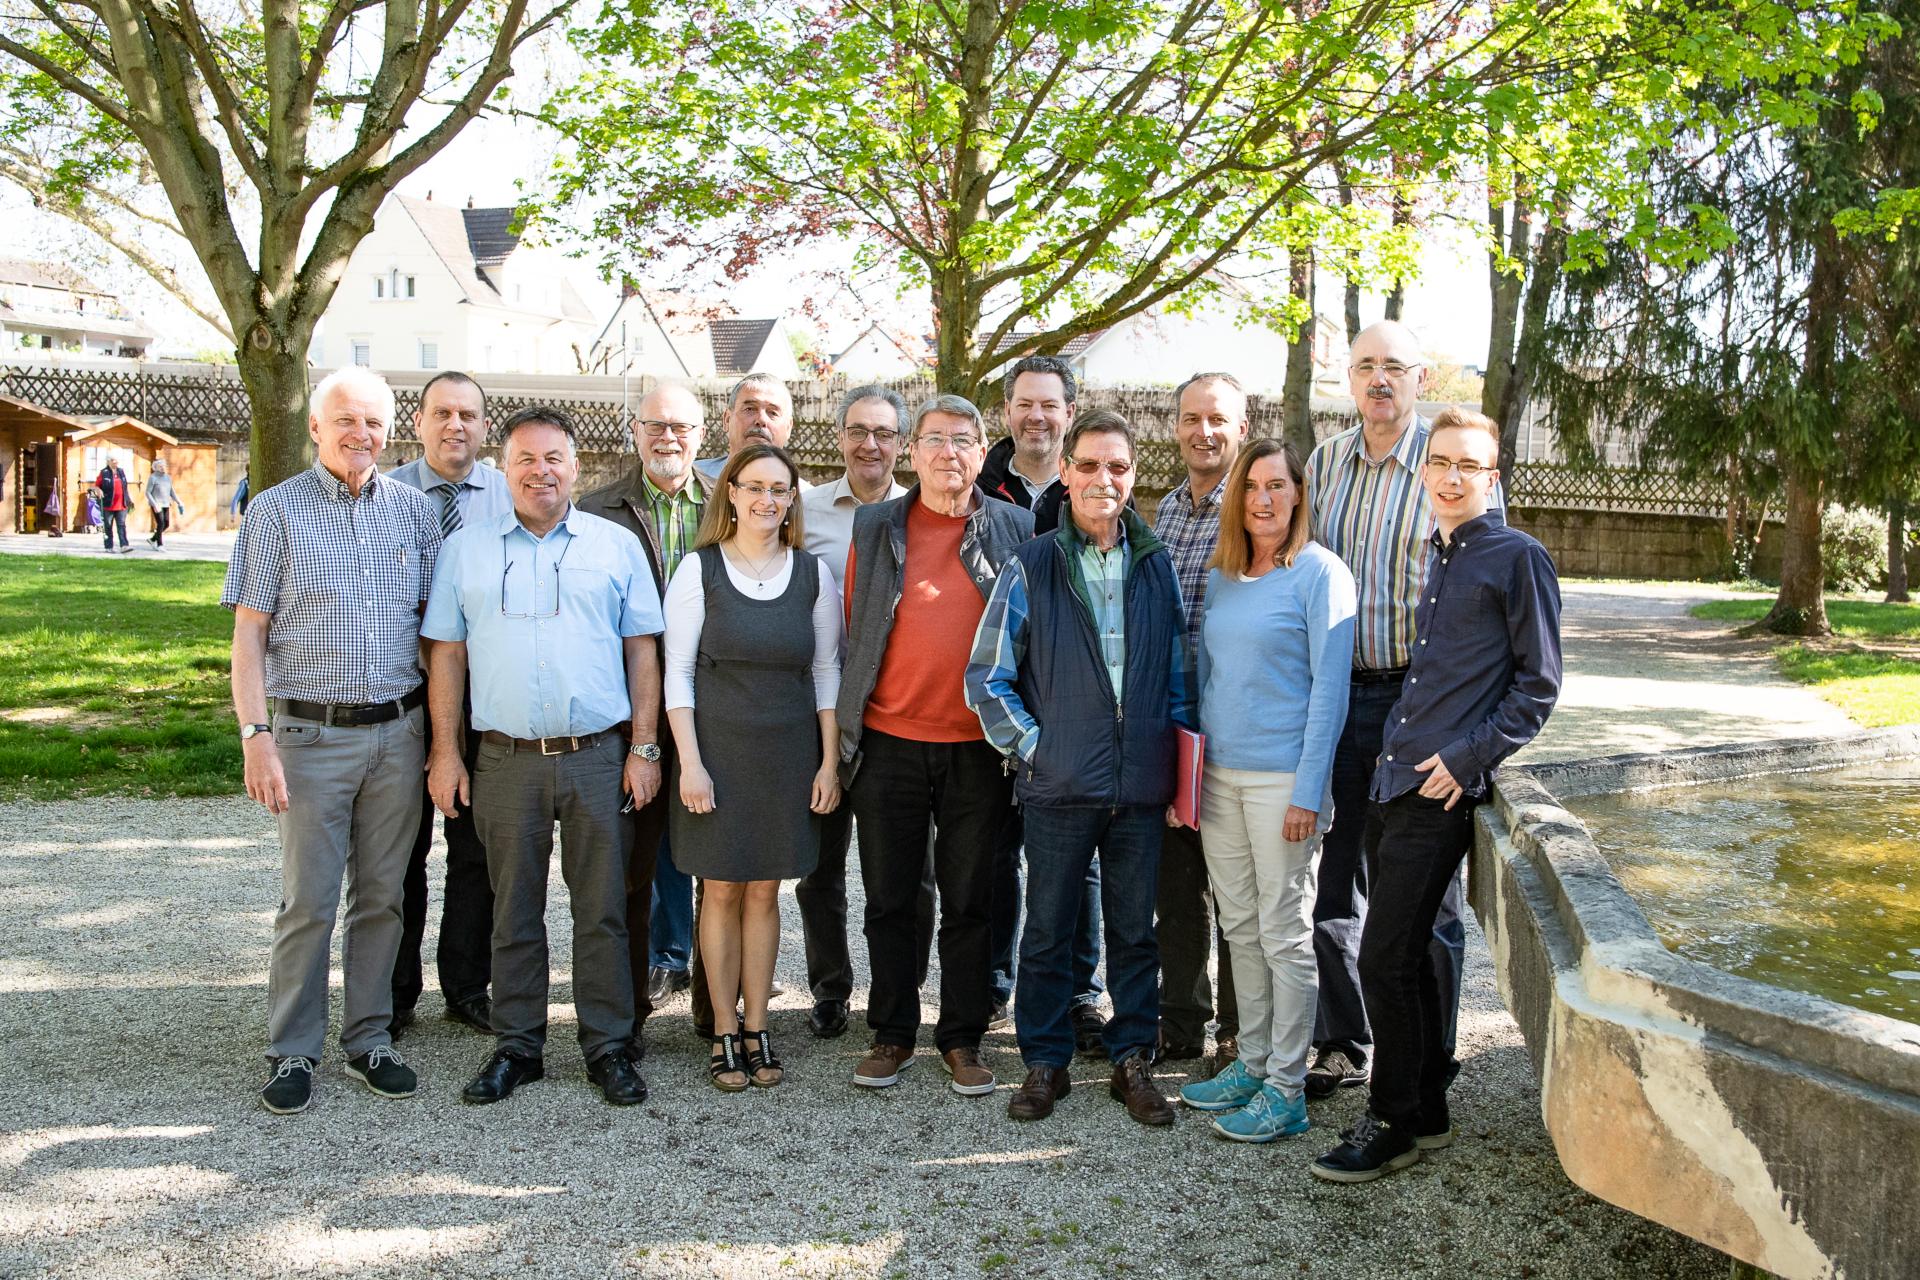 FWG-Kreis-Ahrweiler-Bad-Breisig-Planung-Stadthalle-2019